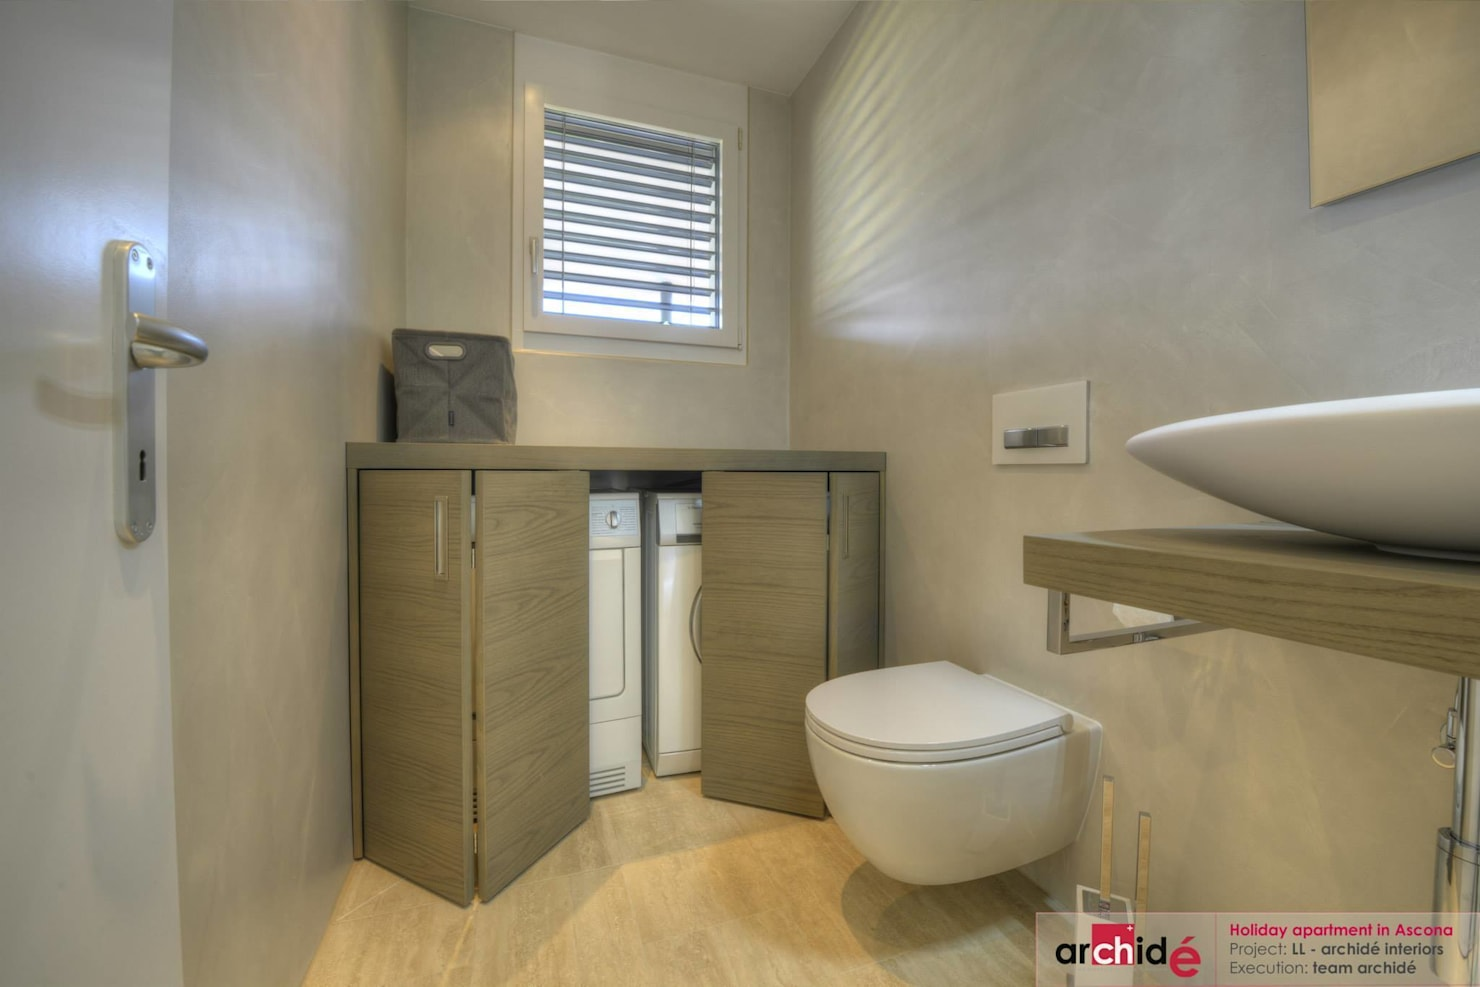 20 design ideas for your small bathroom